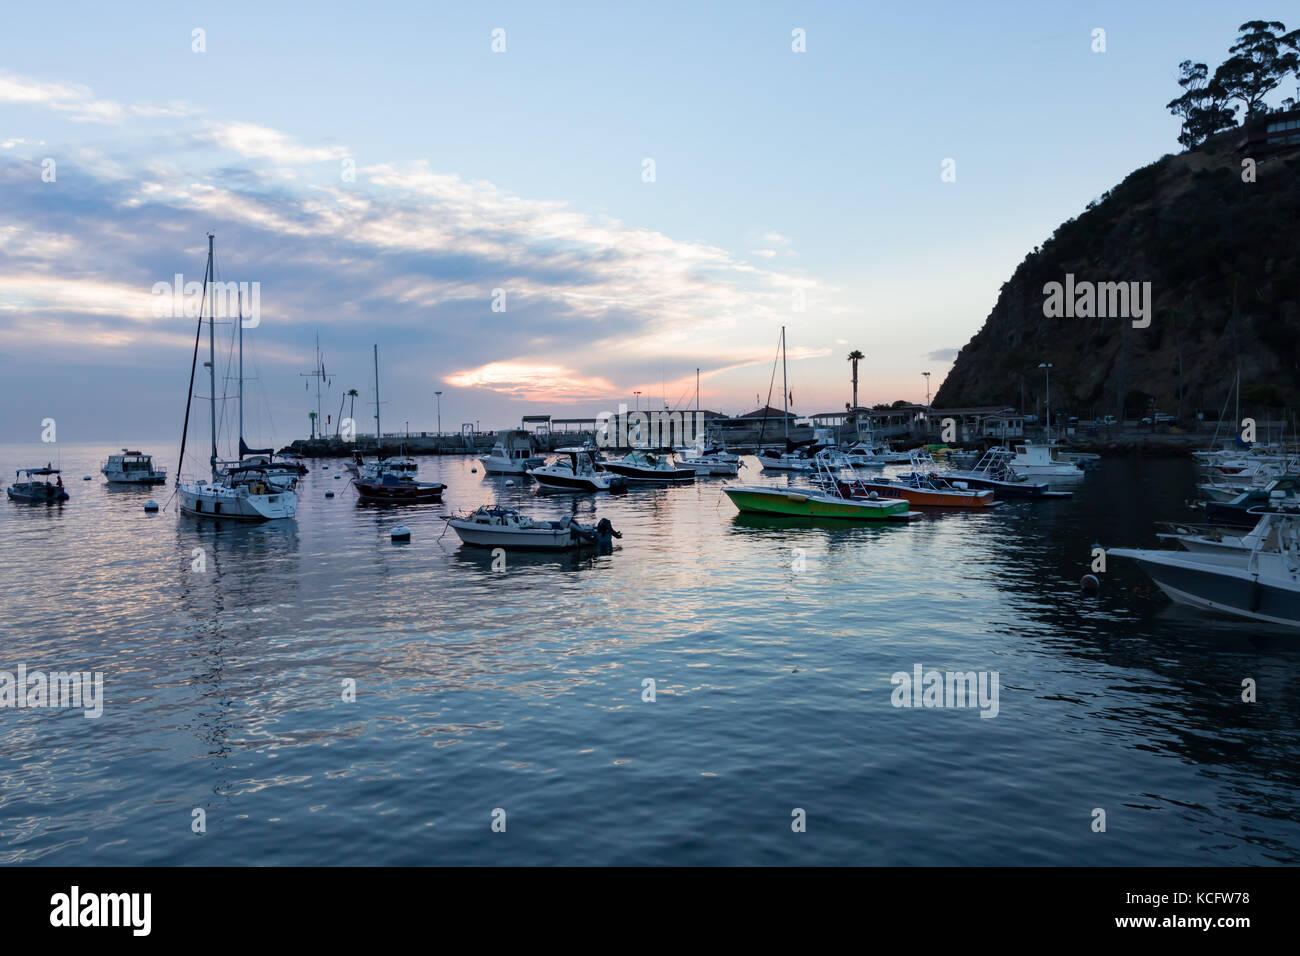 Catalina bay stock photos catalina bay stock images alamy for Catalina bay